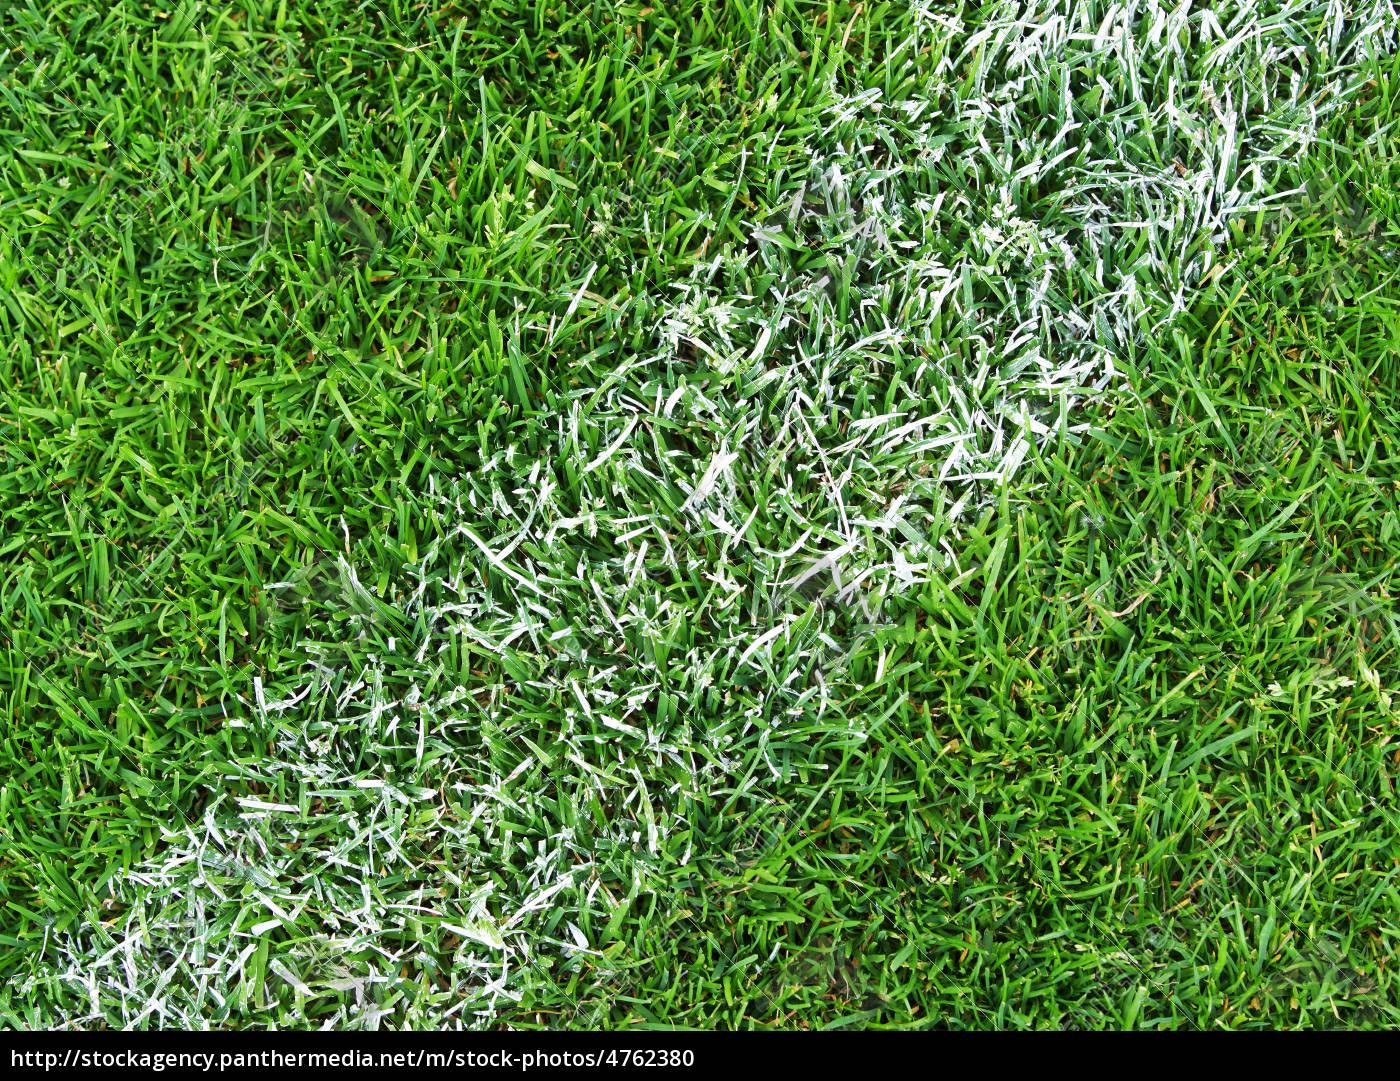 fu ball rasen nahaufnahme soccer grass close up lizenzfreies foto 4762380 bildagentur. Black Bedroom Furniture Sets. Home Design Ideas